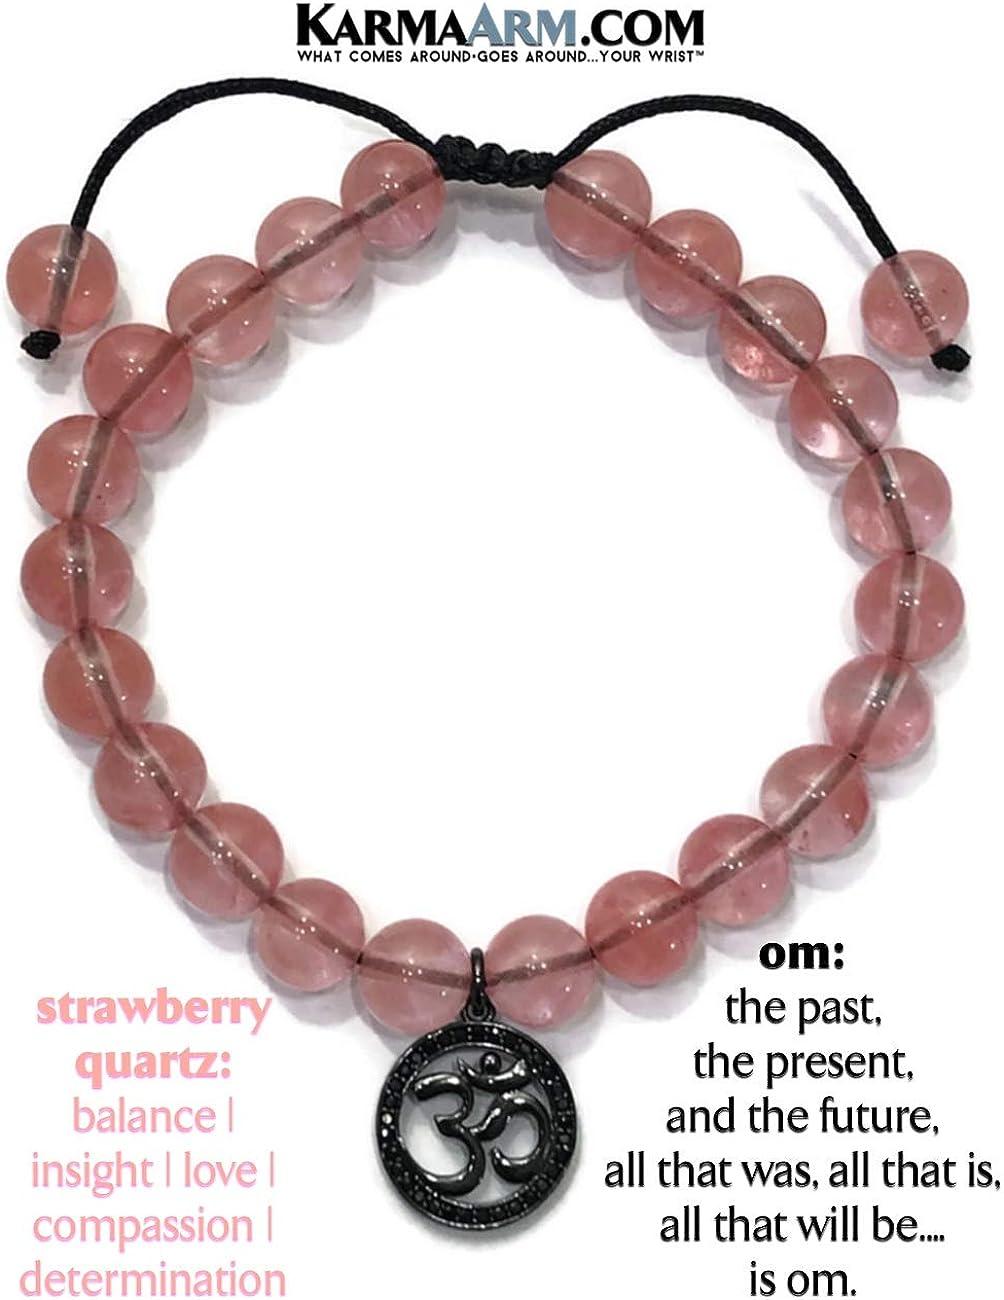 Reiki Chakra Yoga Zen Meditation Jewelry Natural Silver Hematite Gemstone KarmaArm Confidence CZ Diamond Pave Barrel